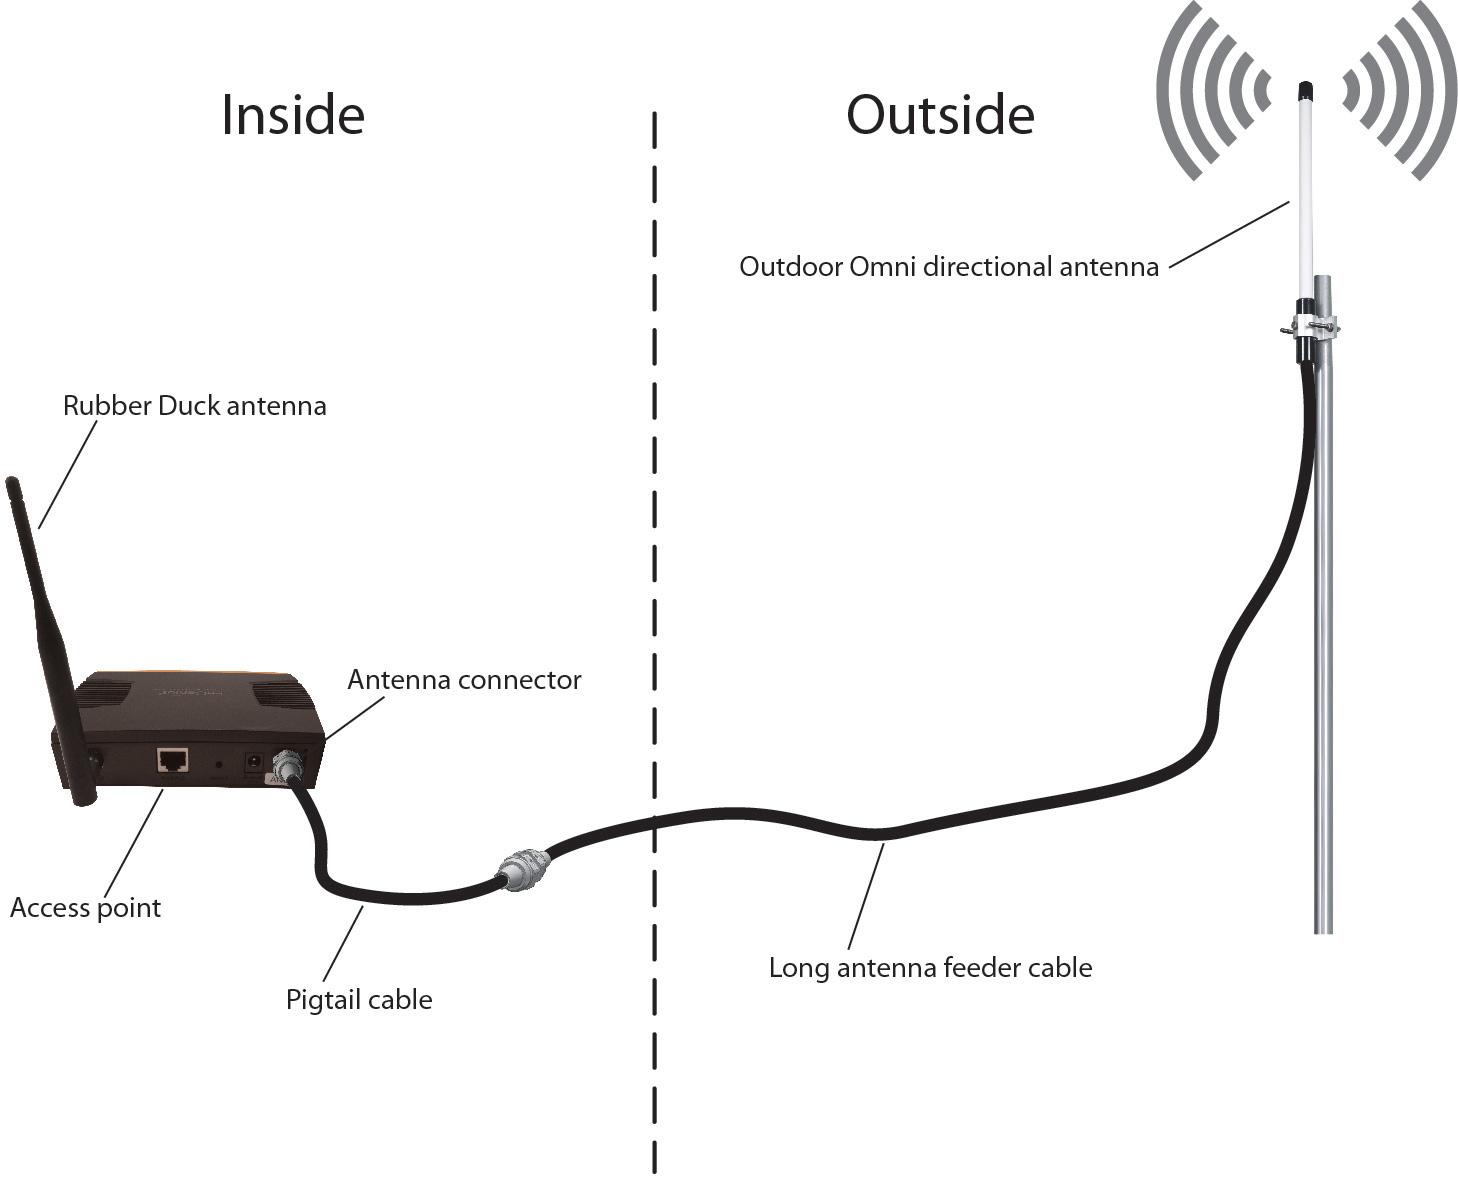 [DIAGRAM_38IU]  How to upgrade WiFi access point antennas   L-com.com   Wifi access,  Antennas, Wifi   Wireless Antenna Diagram      Pinterest